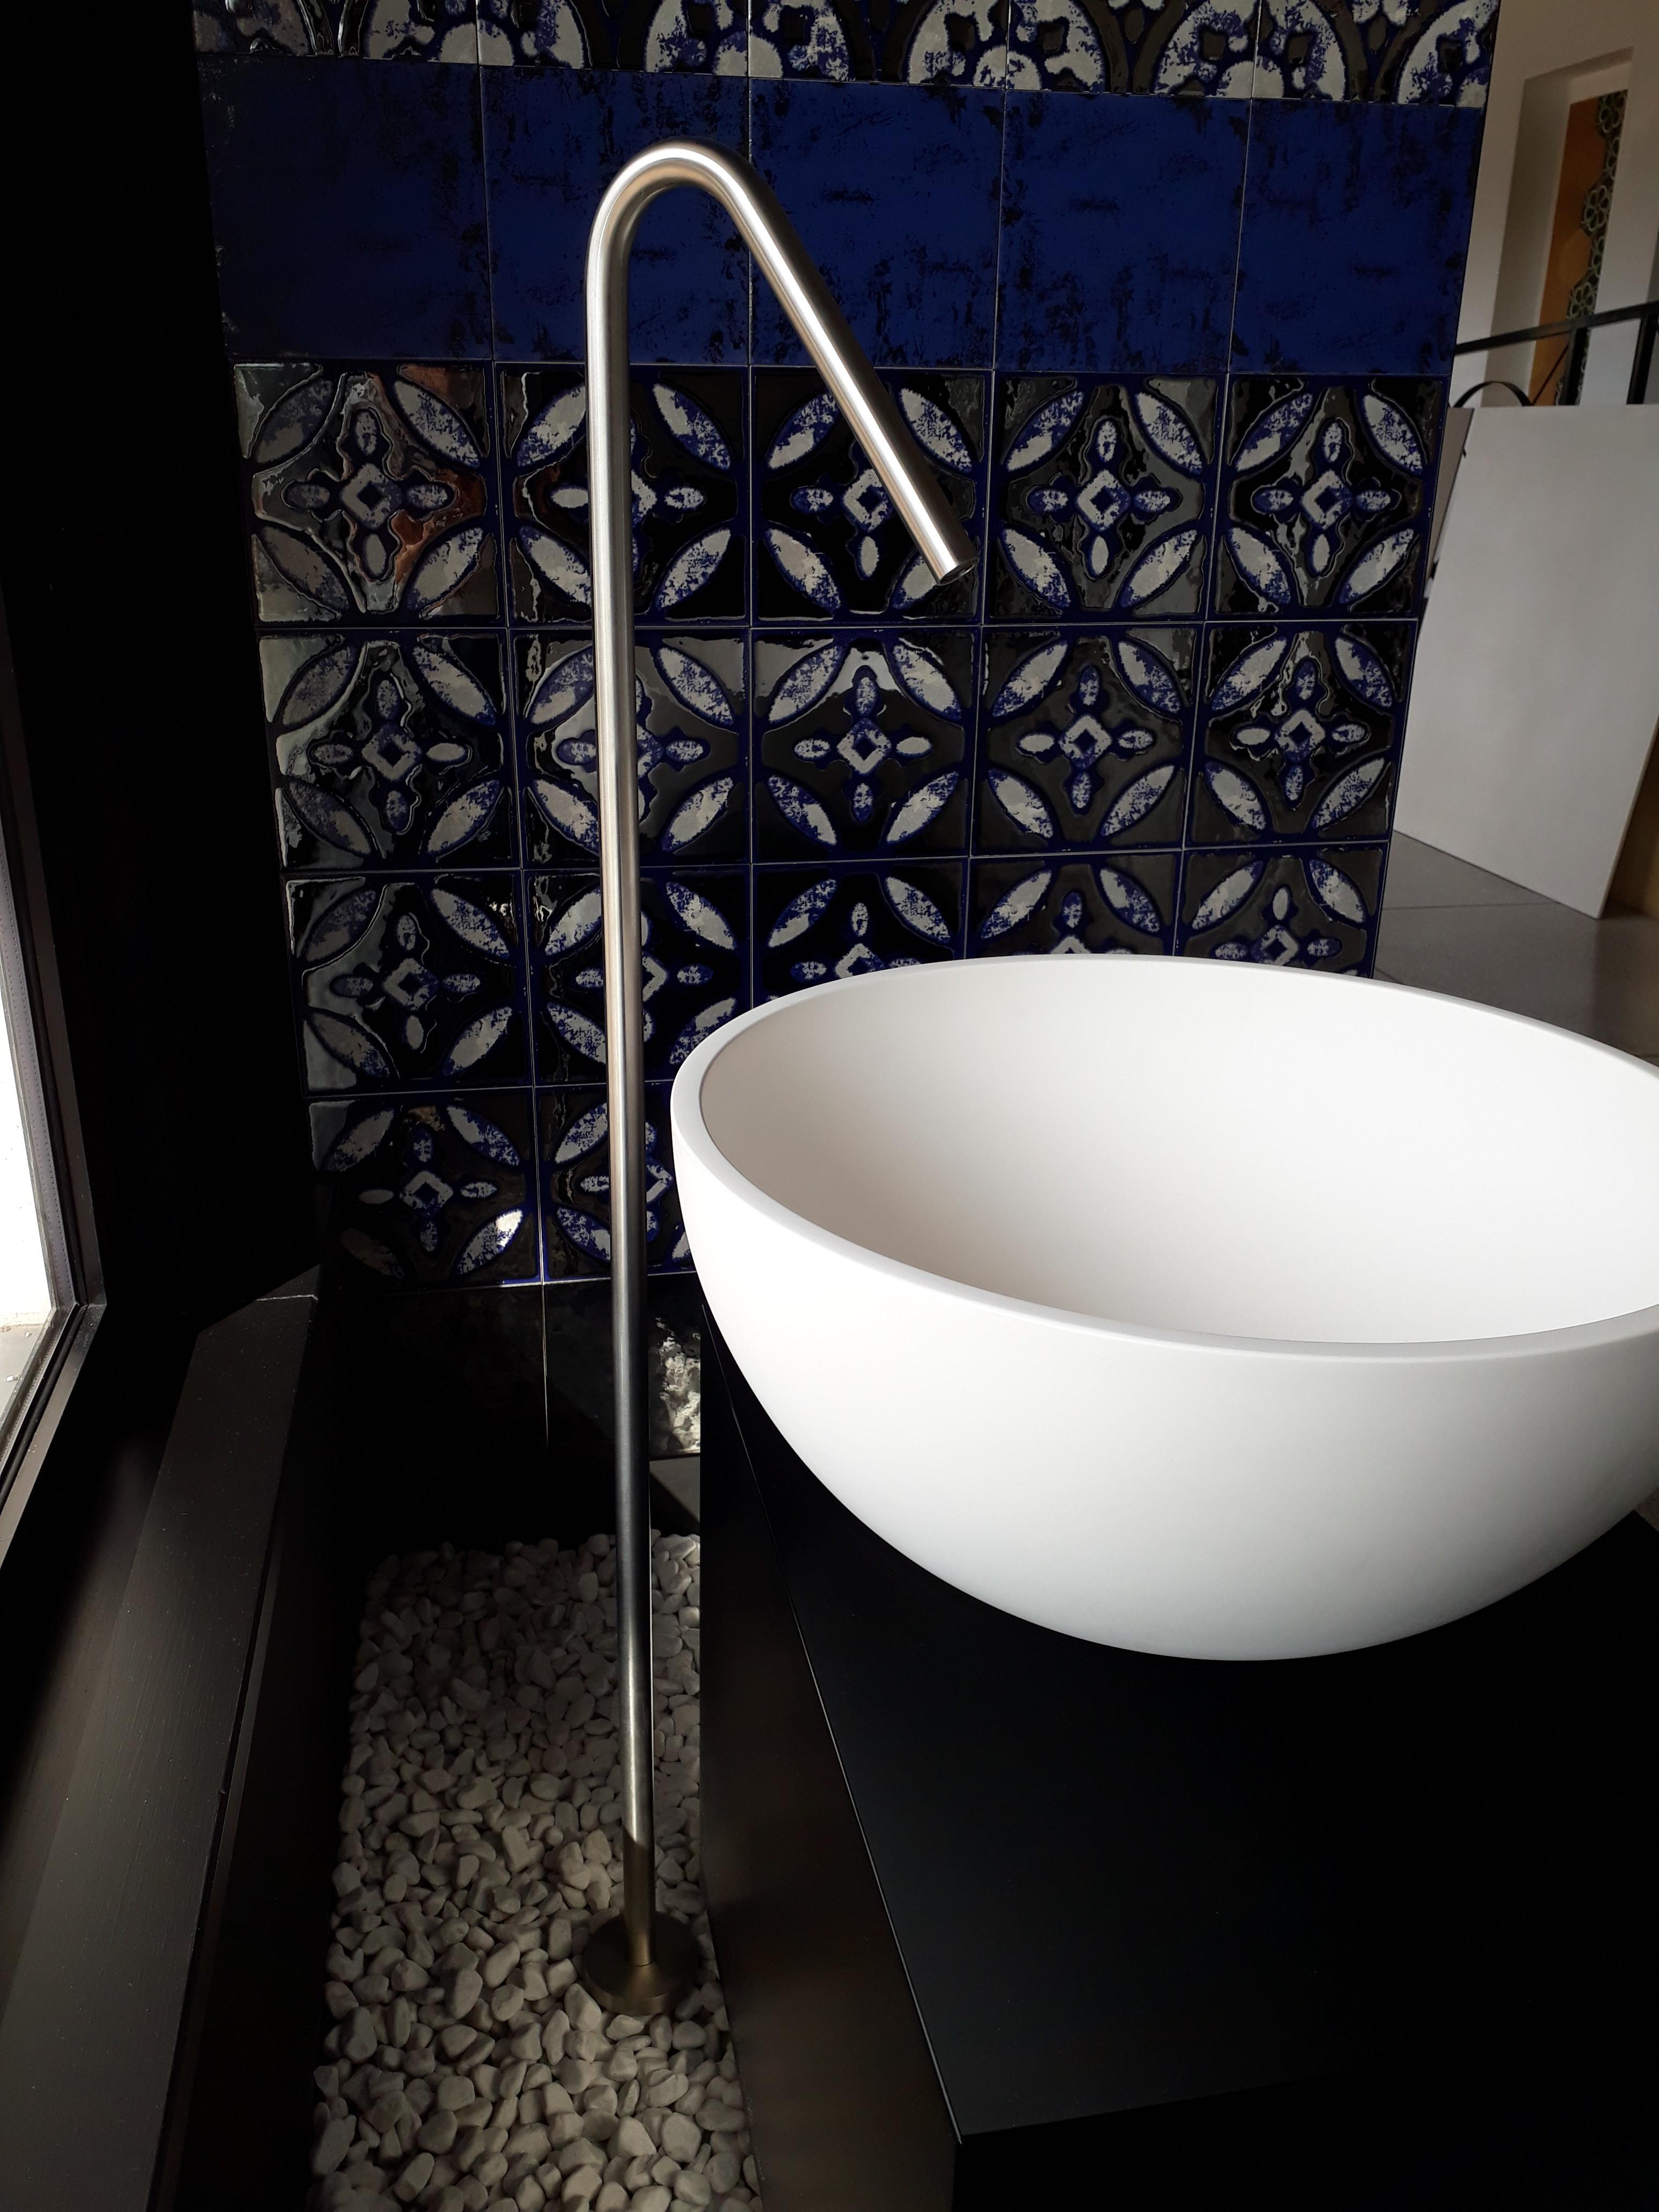 Canna da terra per lavabo Antonio Lupi Ayatisimple - Bagno-Store .com